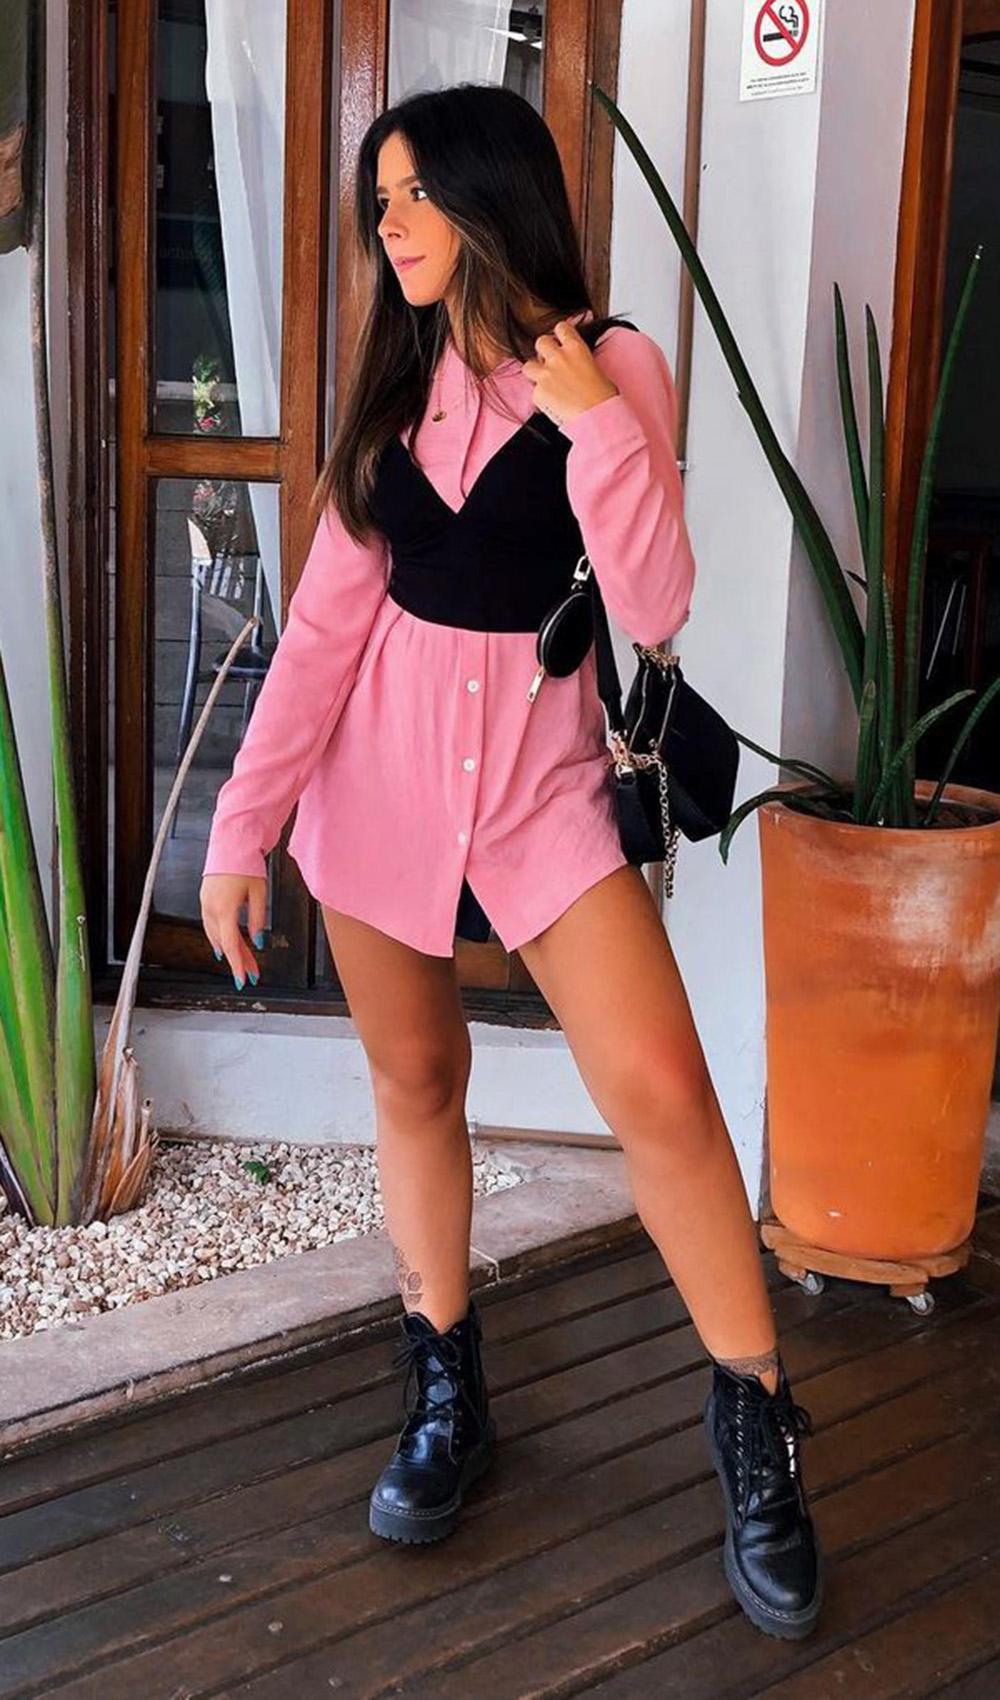 camisa social rosa, cropped preto e coturno